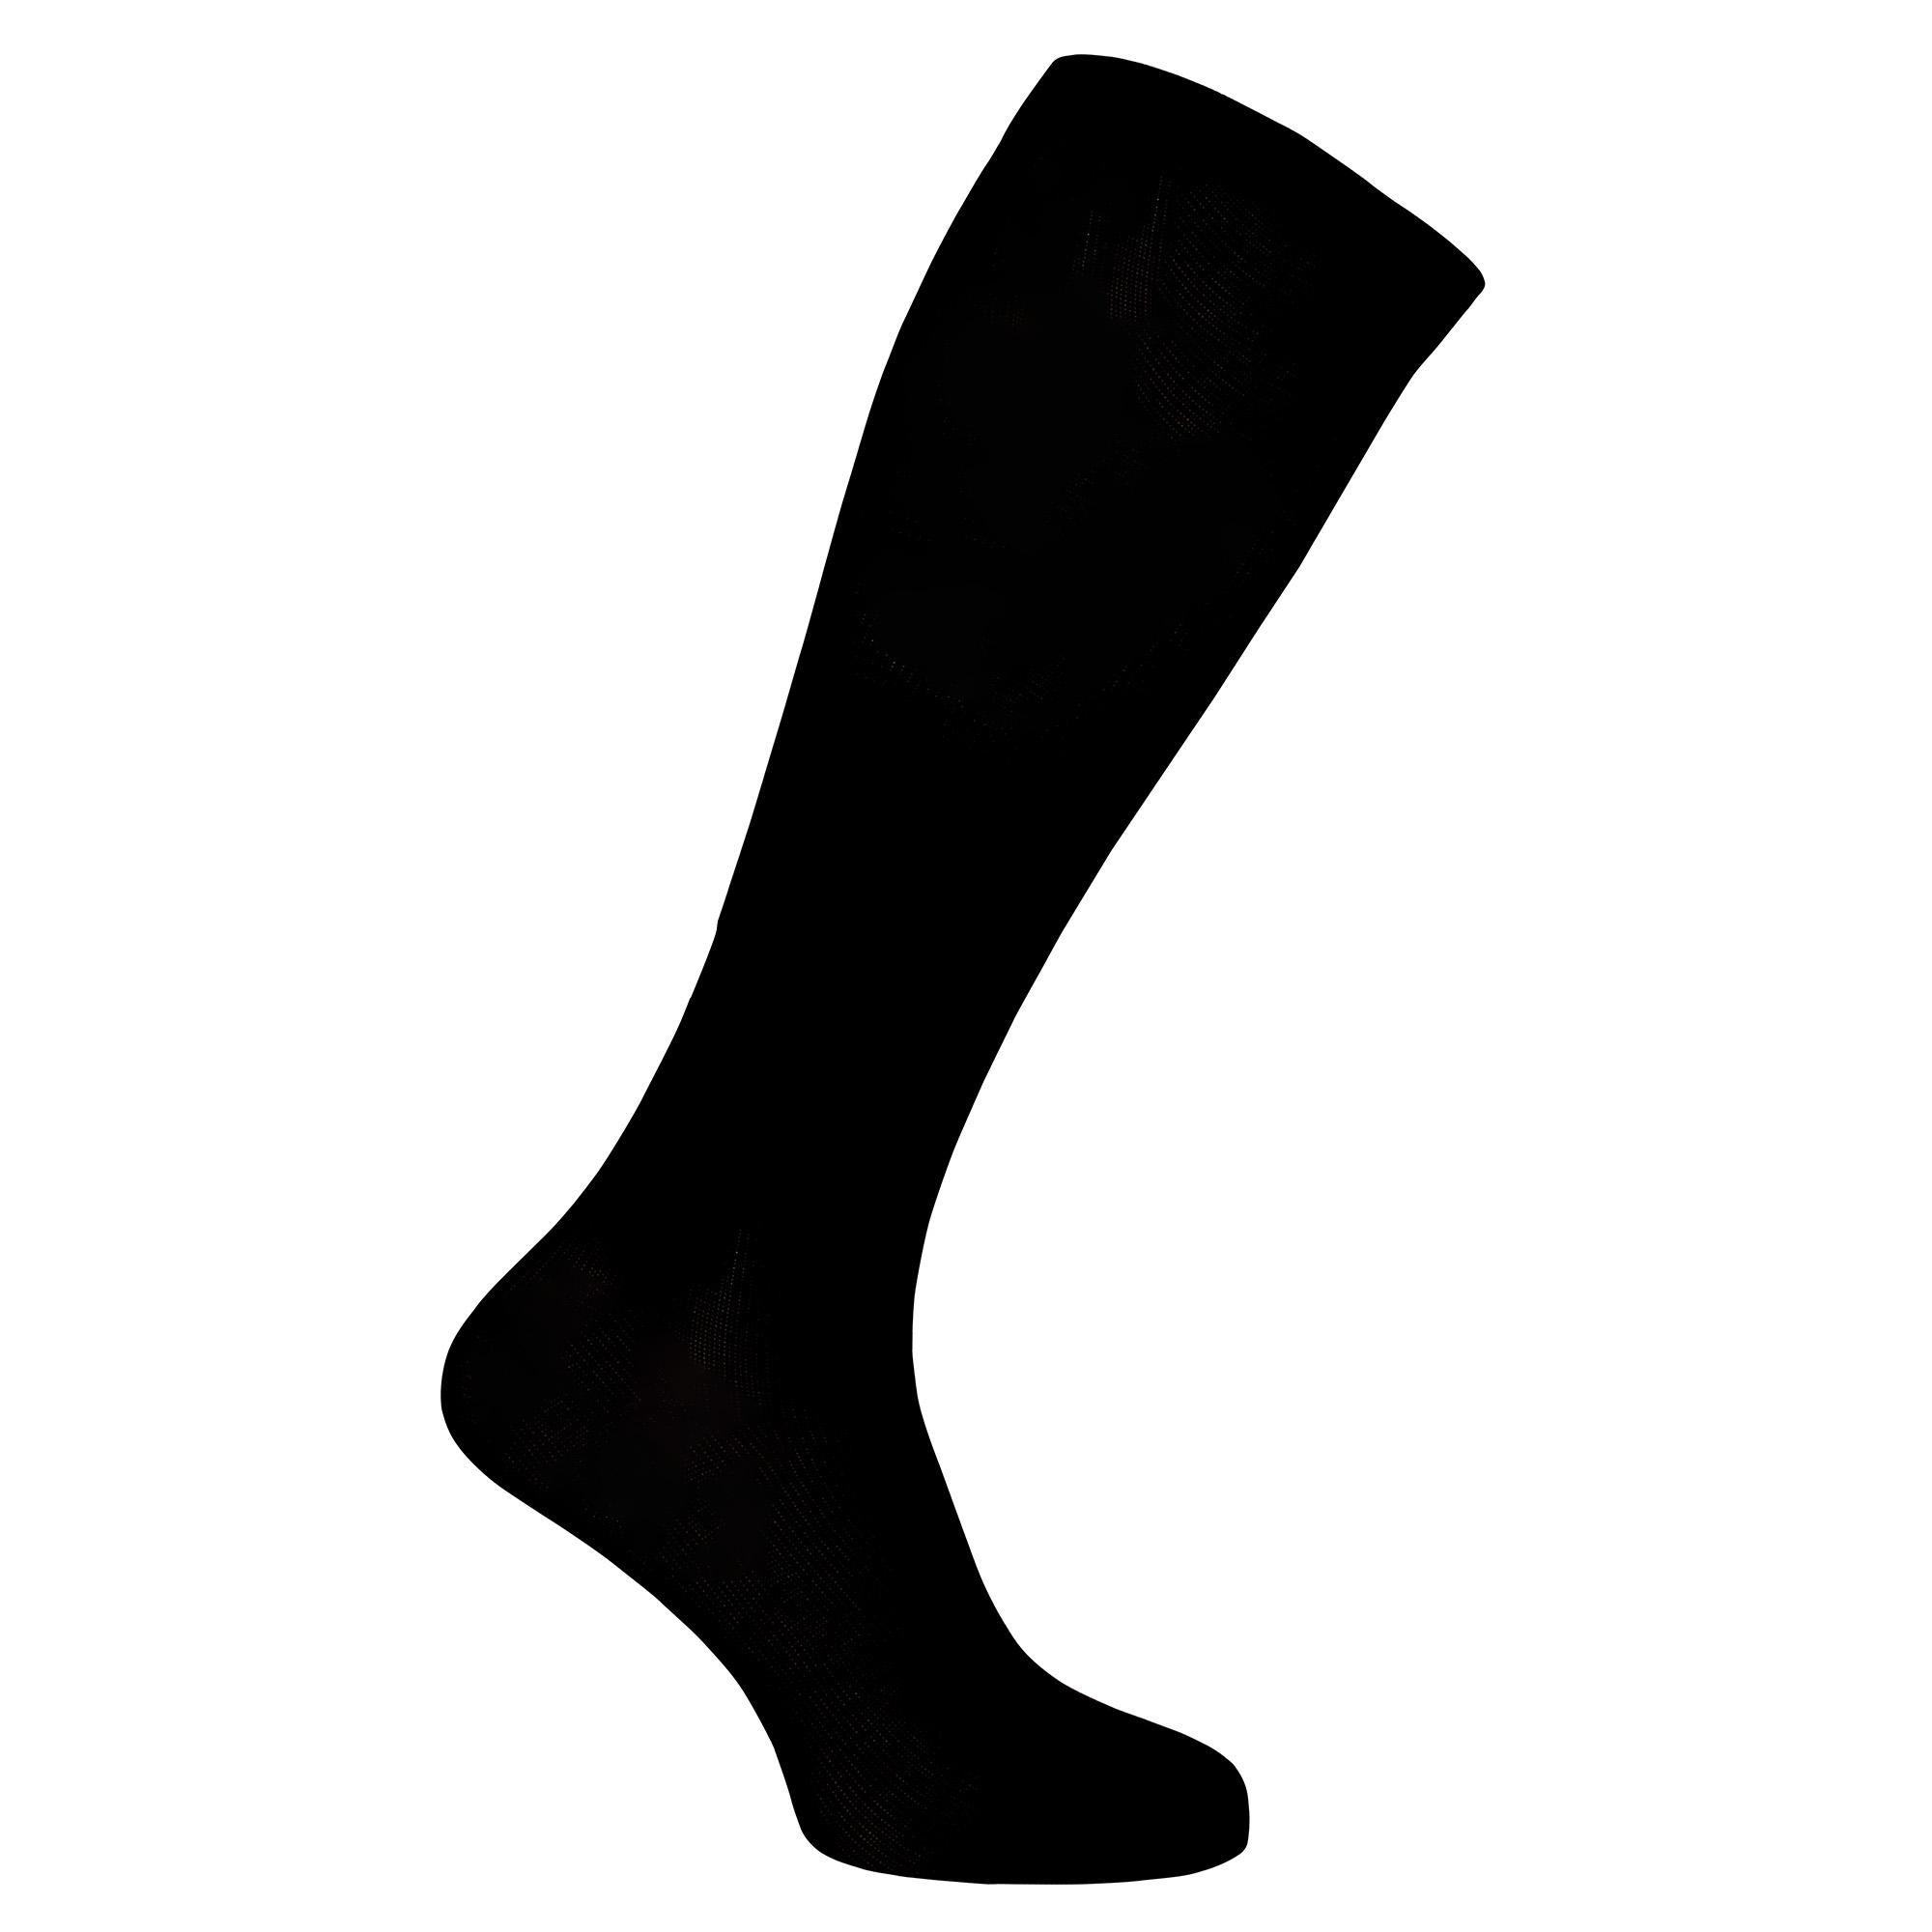 Pharma Sock Unisex Compression Socks (1 Pair) (S/M) (Black)